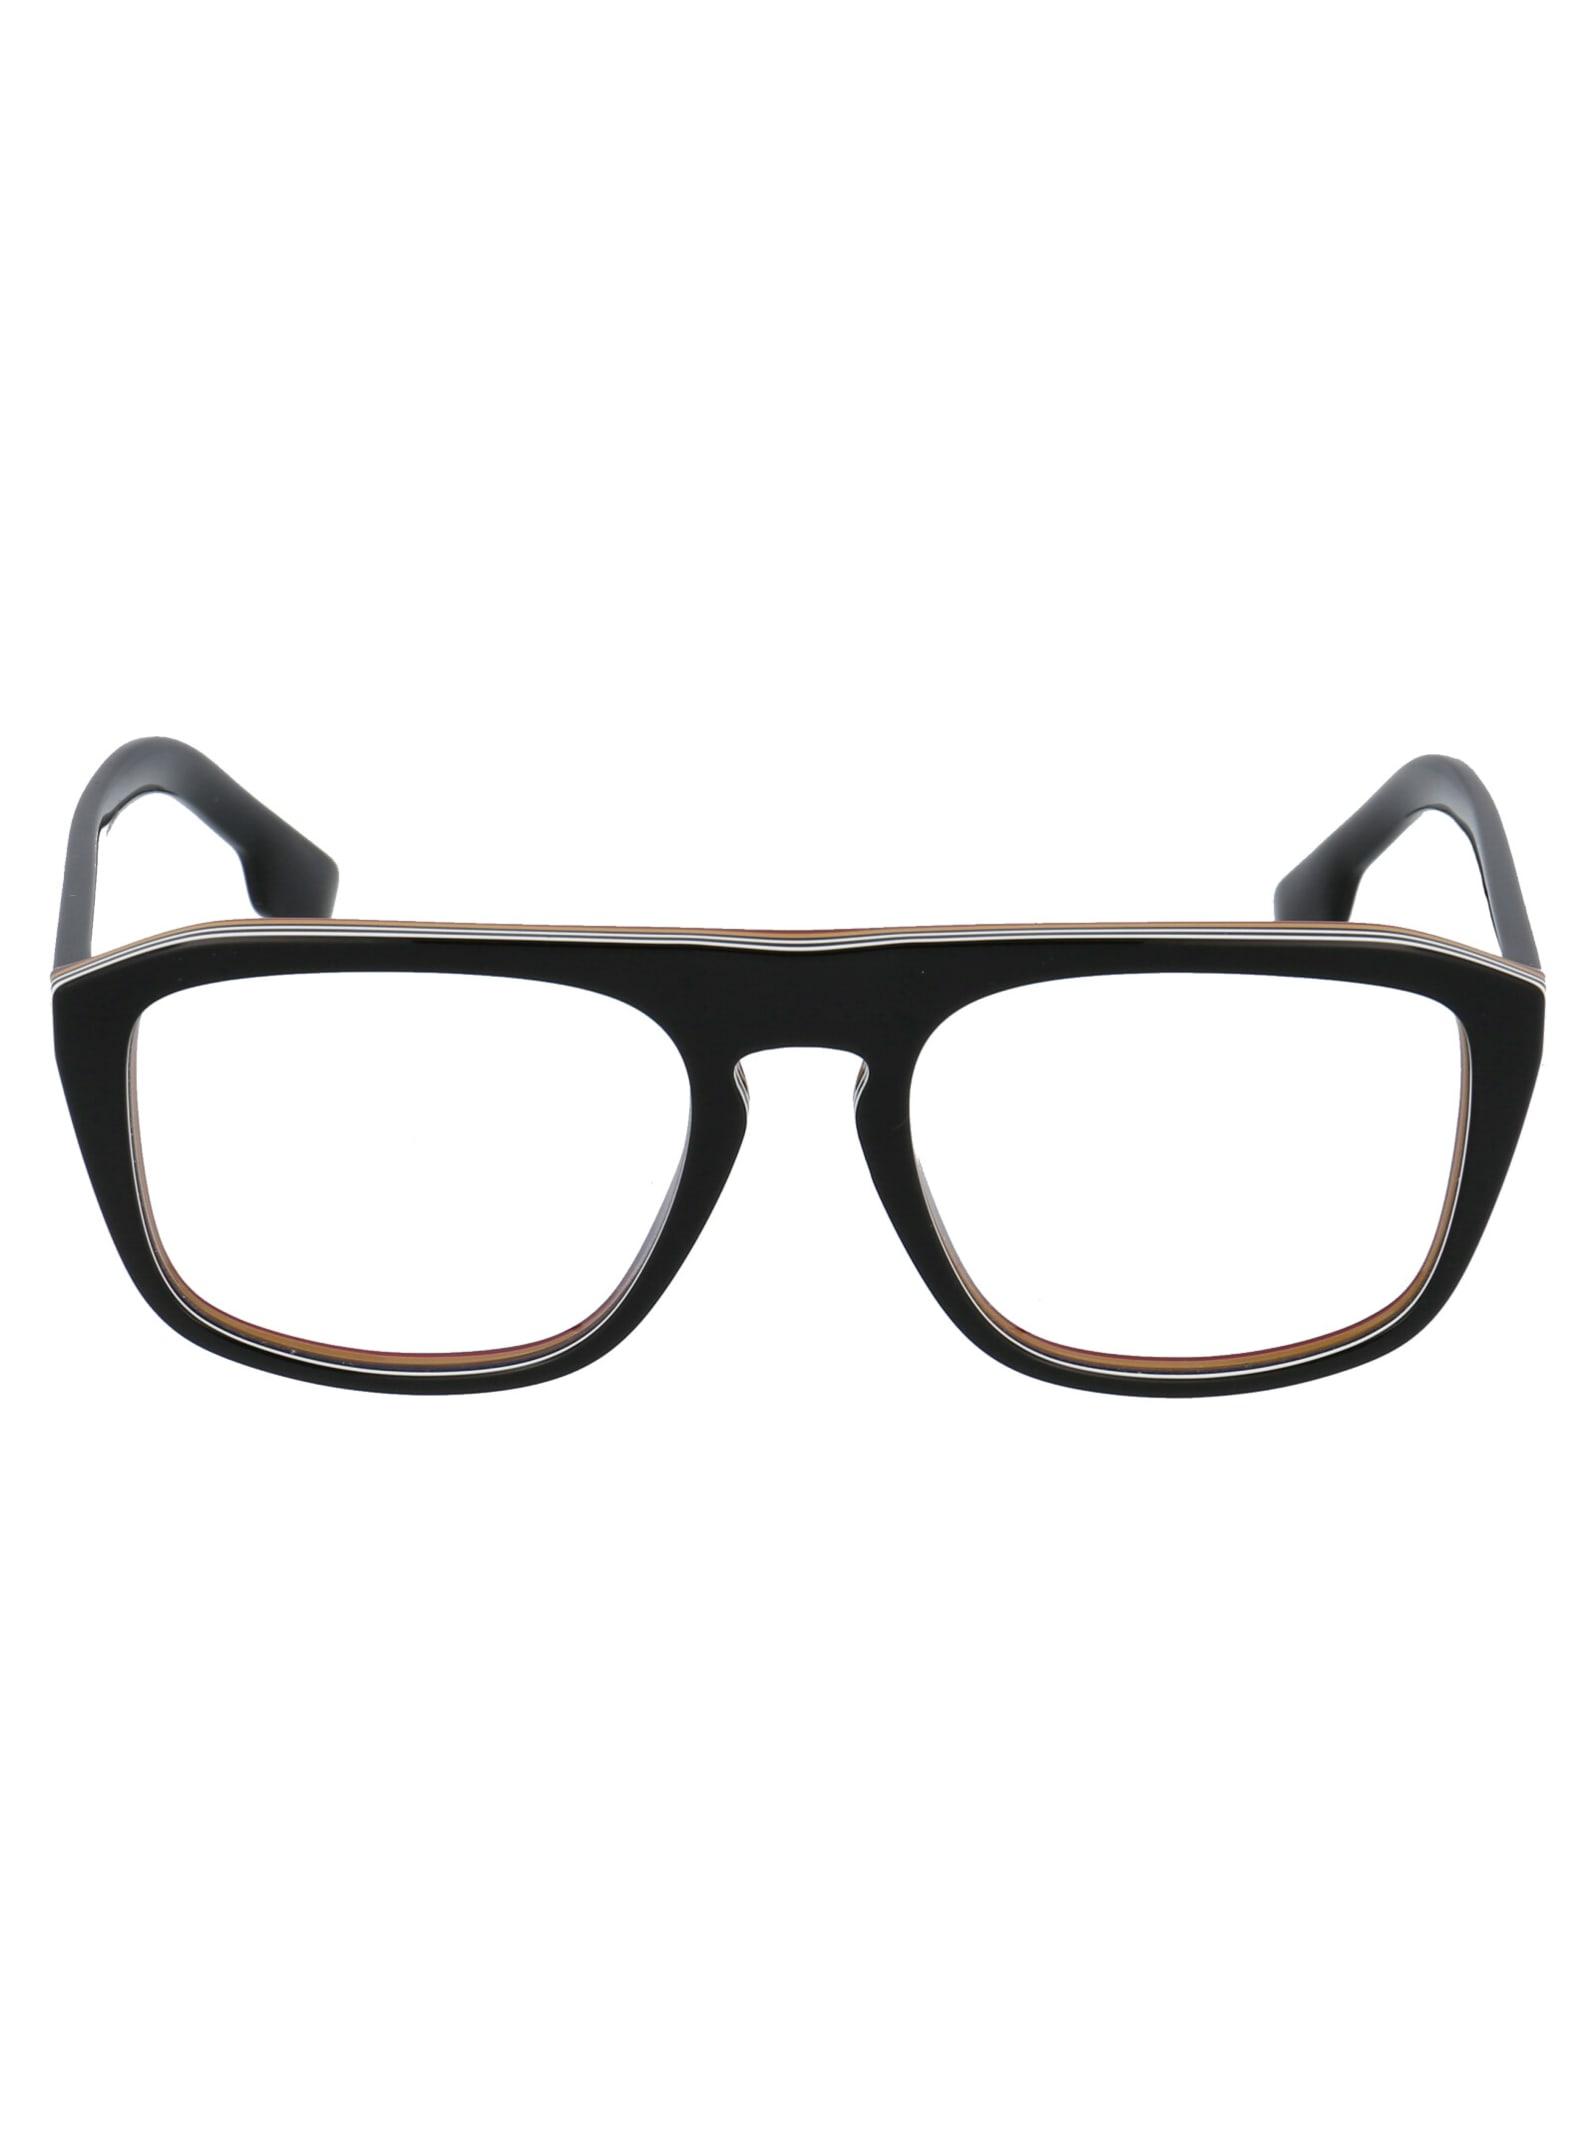 0be4286 Sunglasses